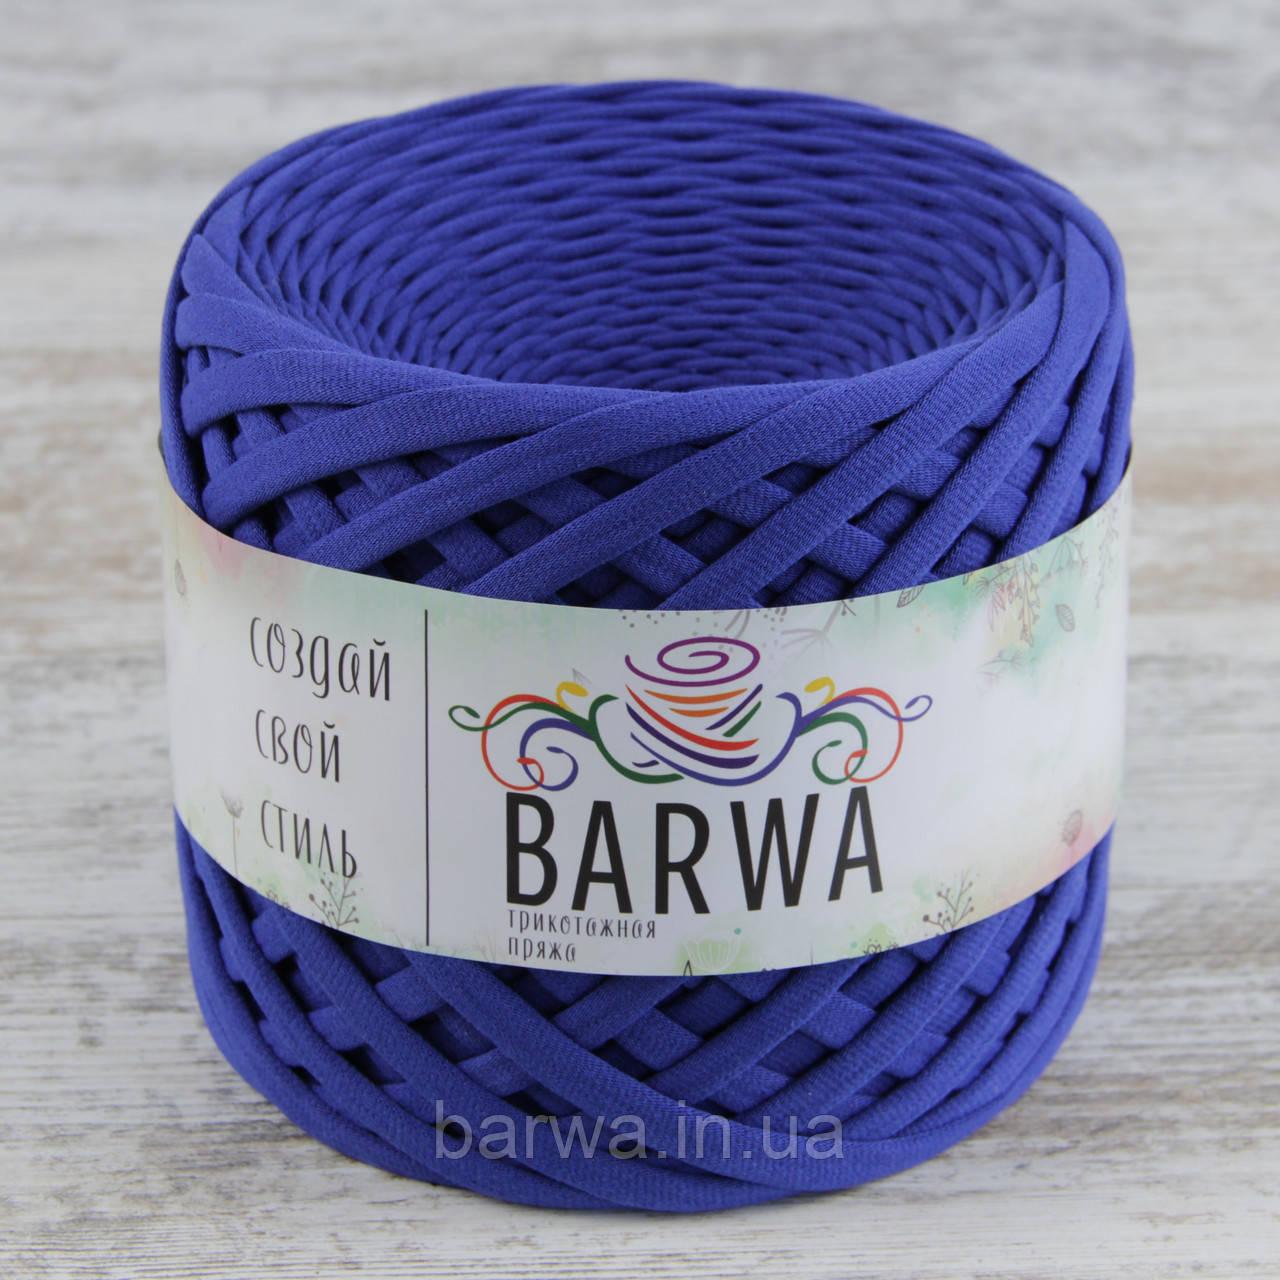 Трикотажная пряжа BARWA standart 7-9 мм, цвет Синий кобальт